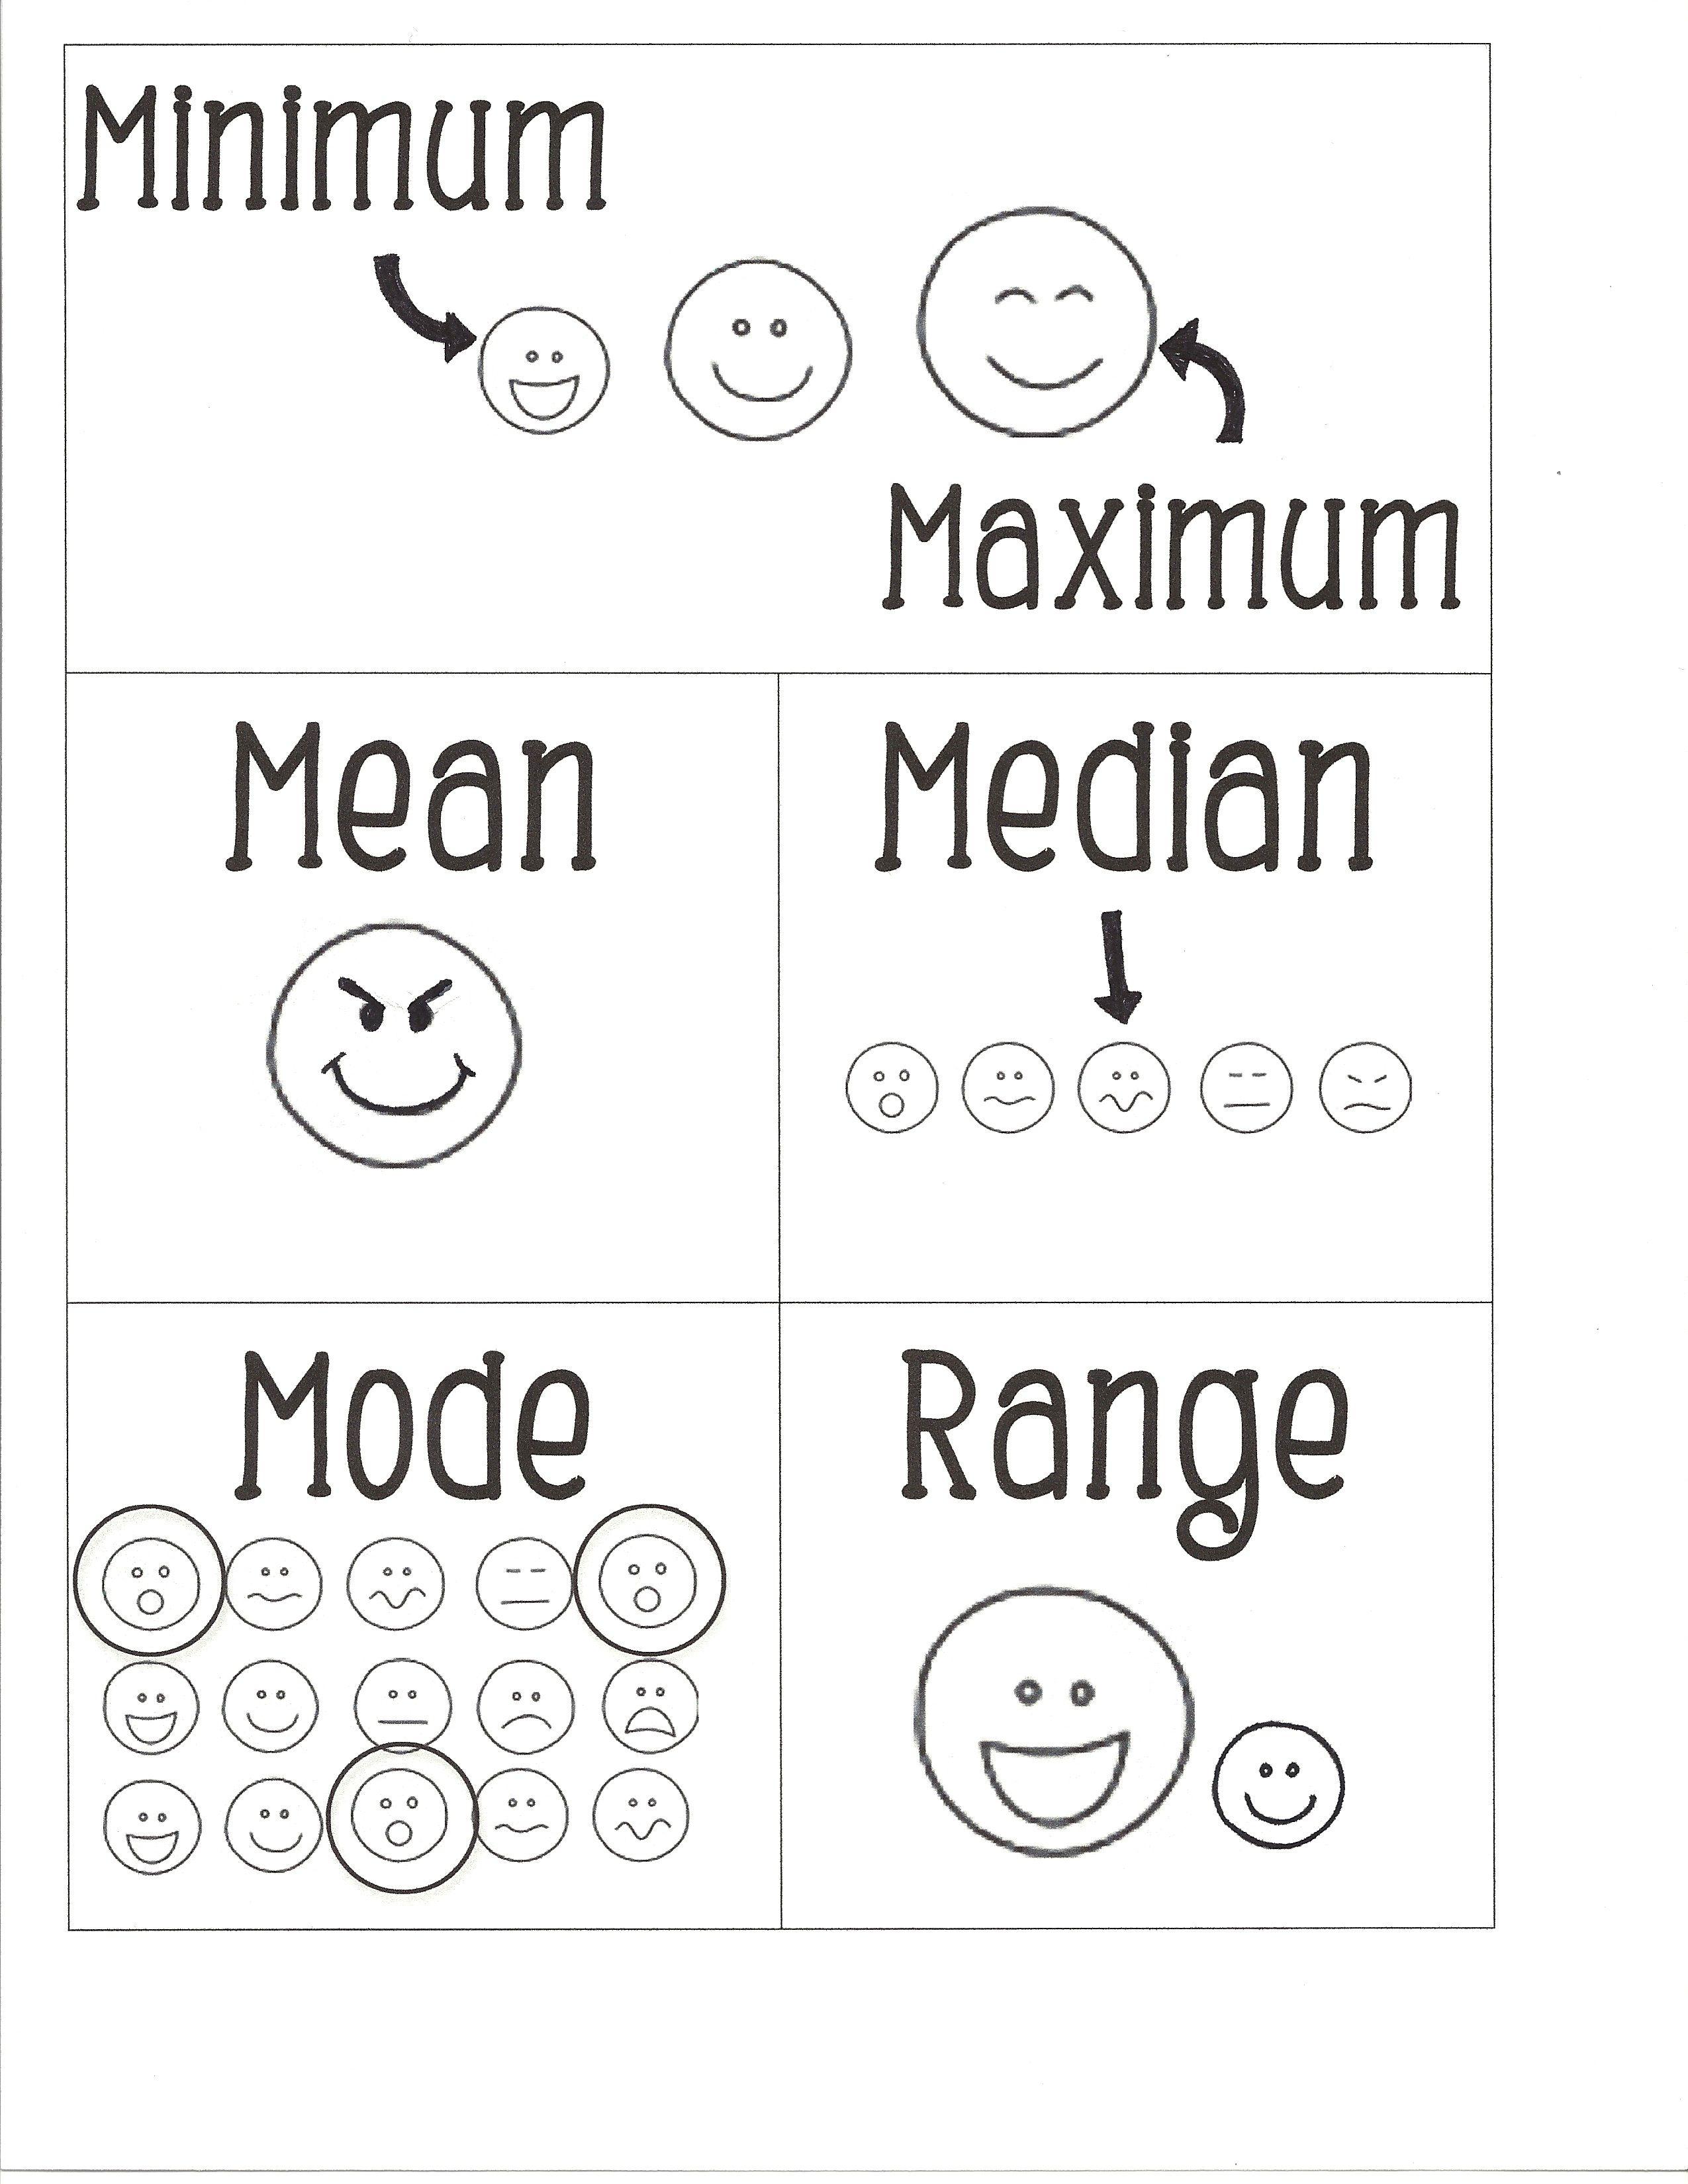 Middle School Minimum Maximum Mean Median Mode Range